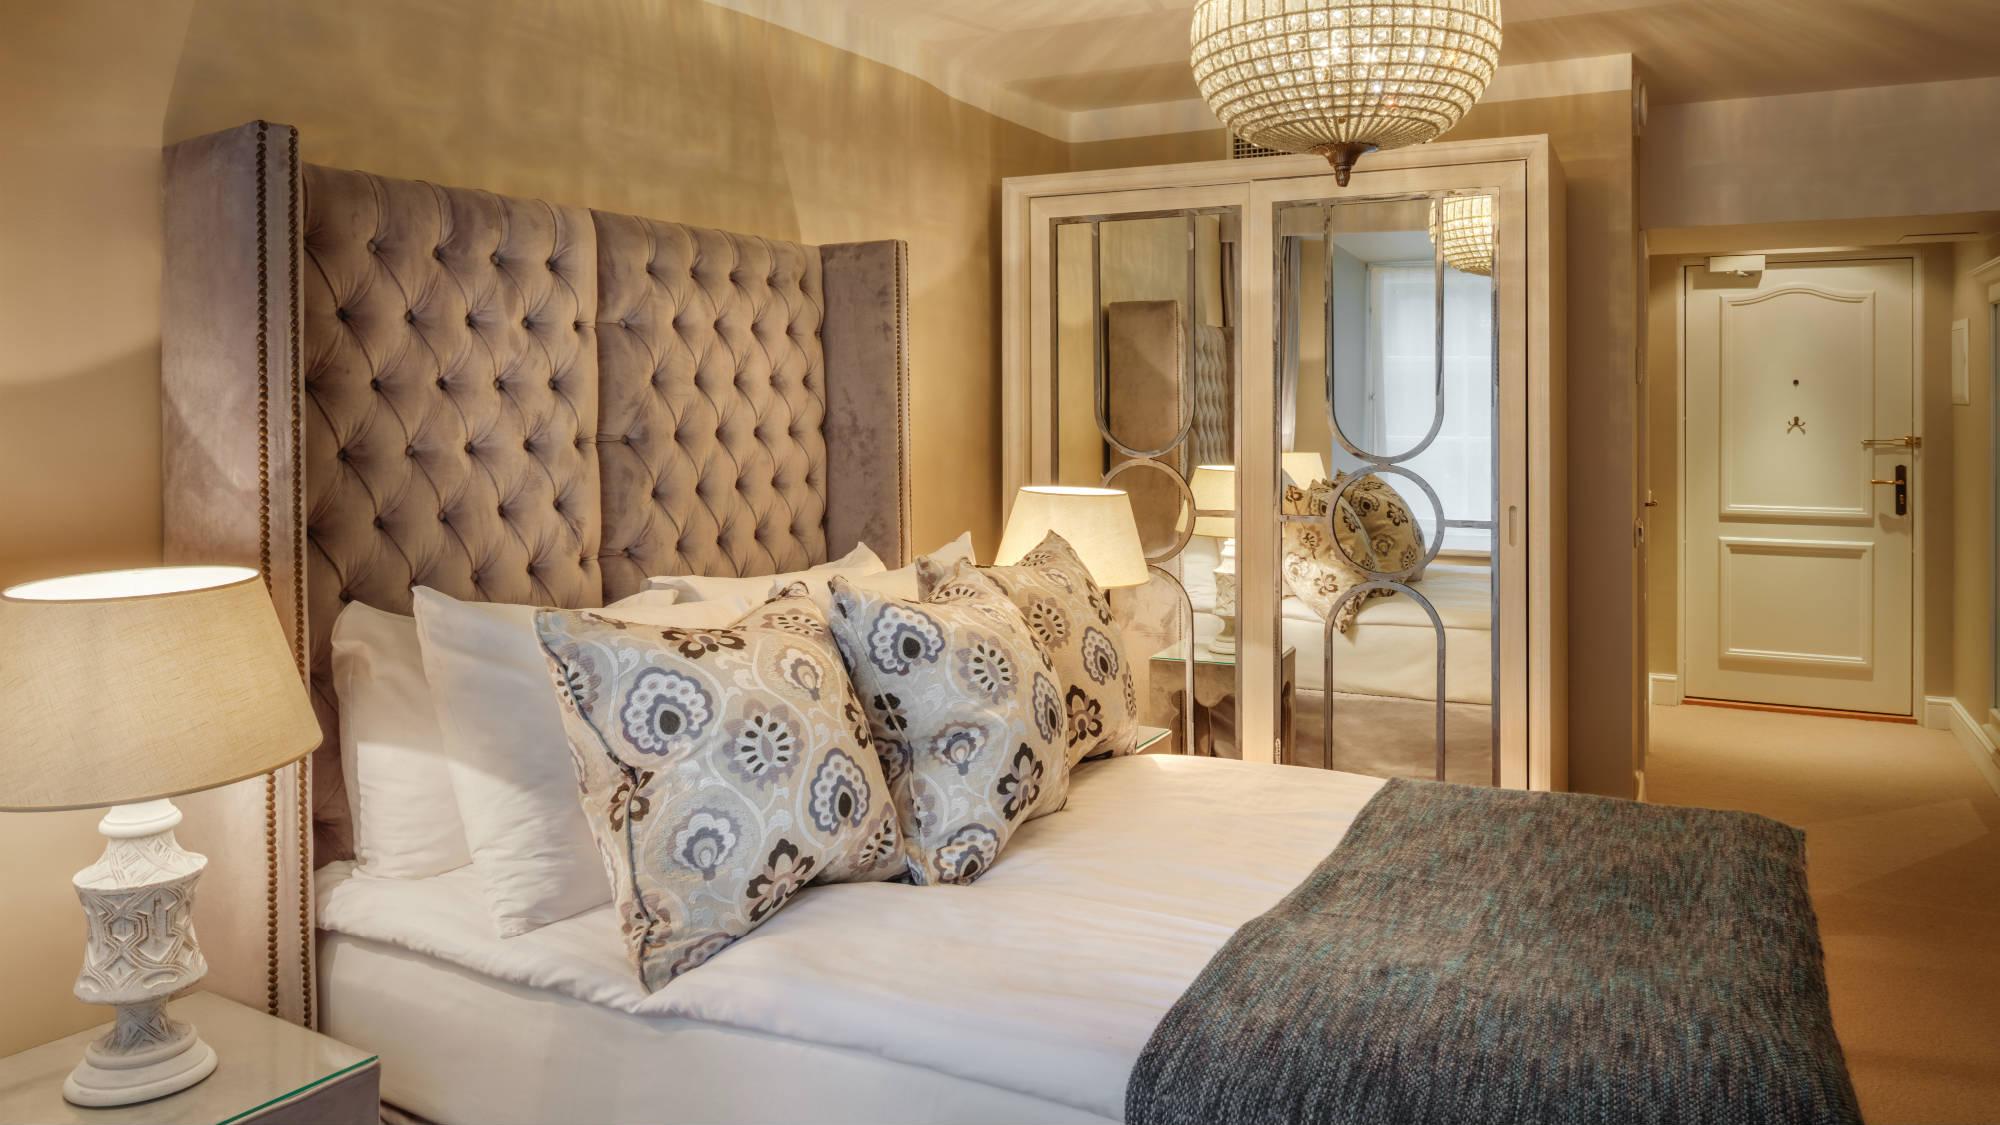 Double Room in luxury Schlssle Hotel Classic Double Room Tallinn